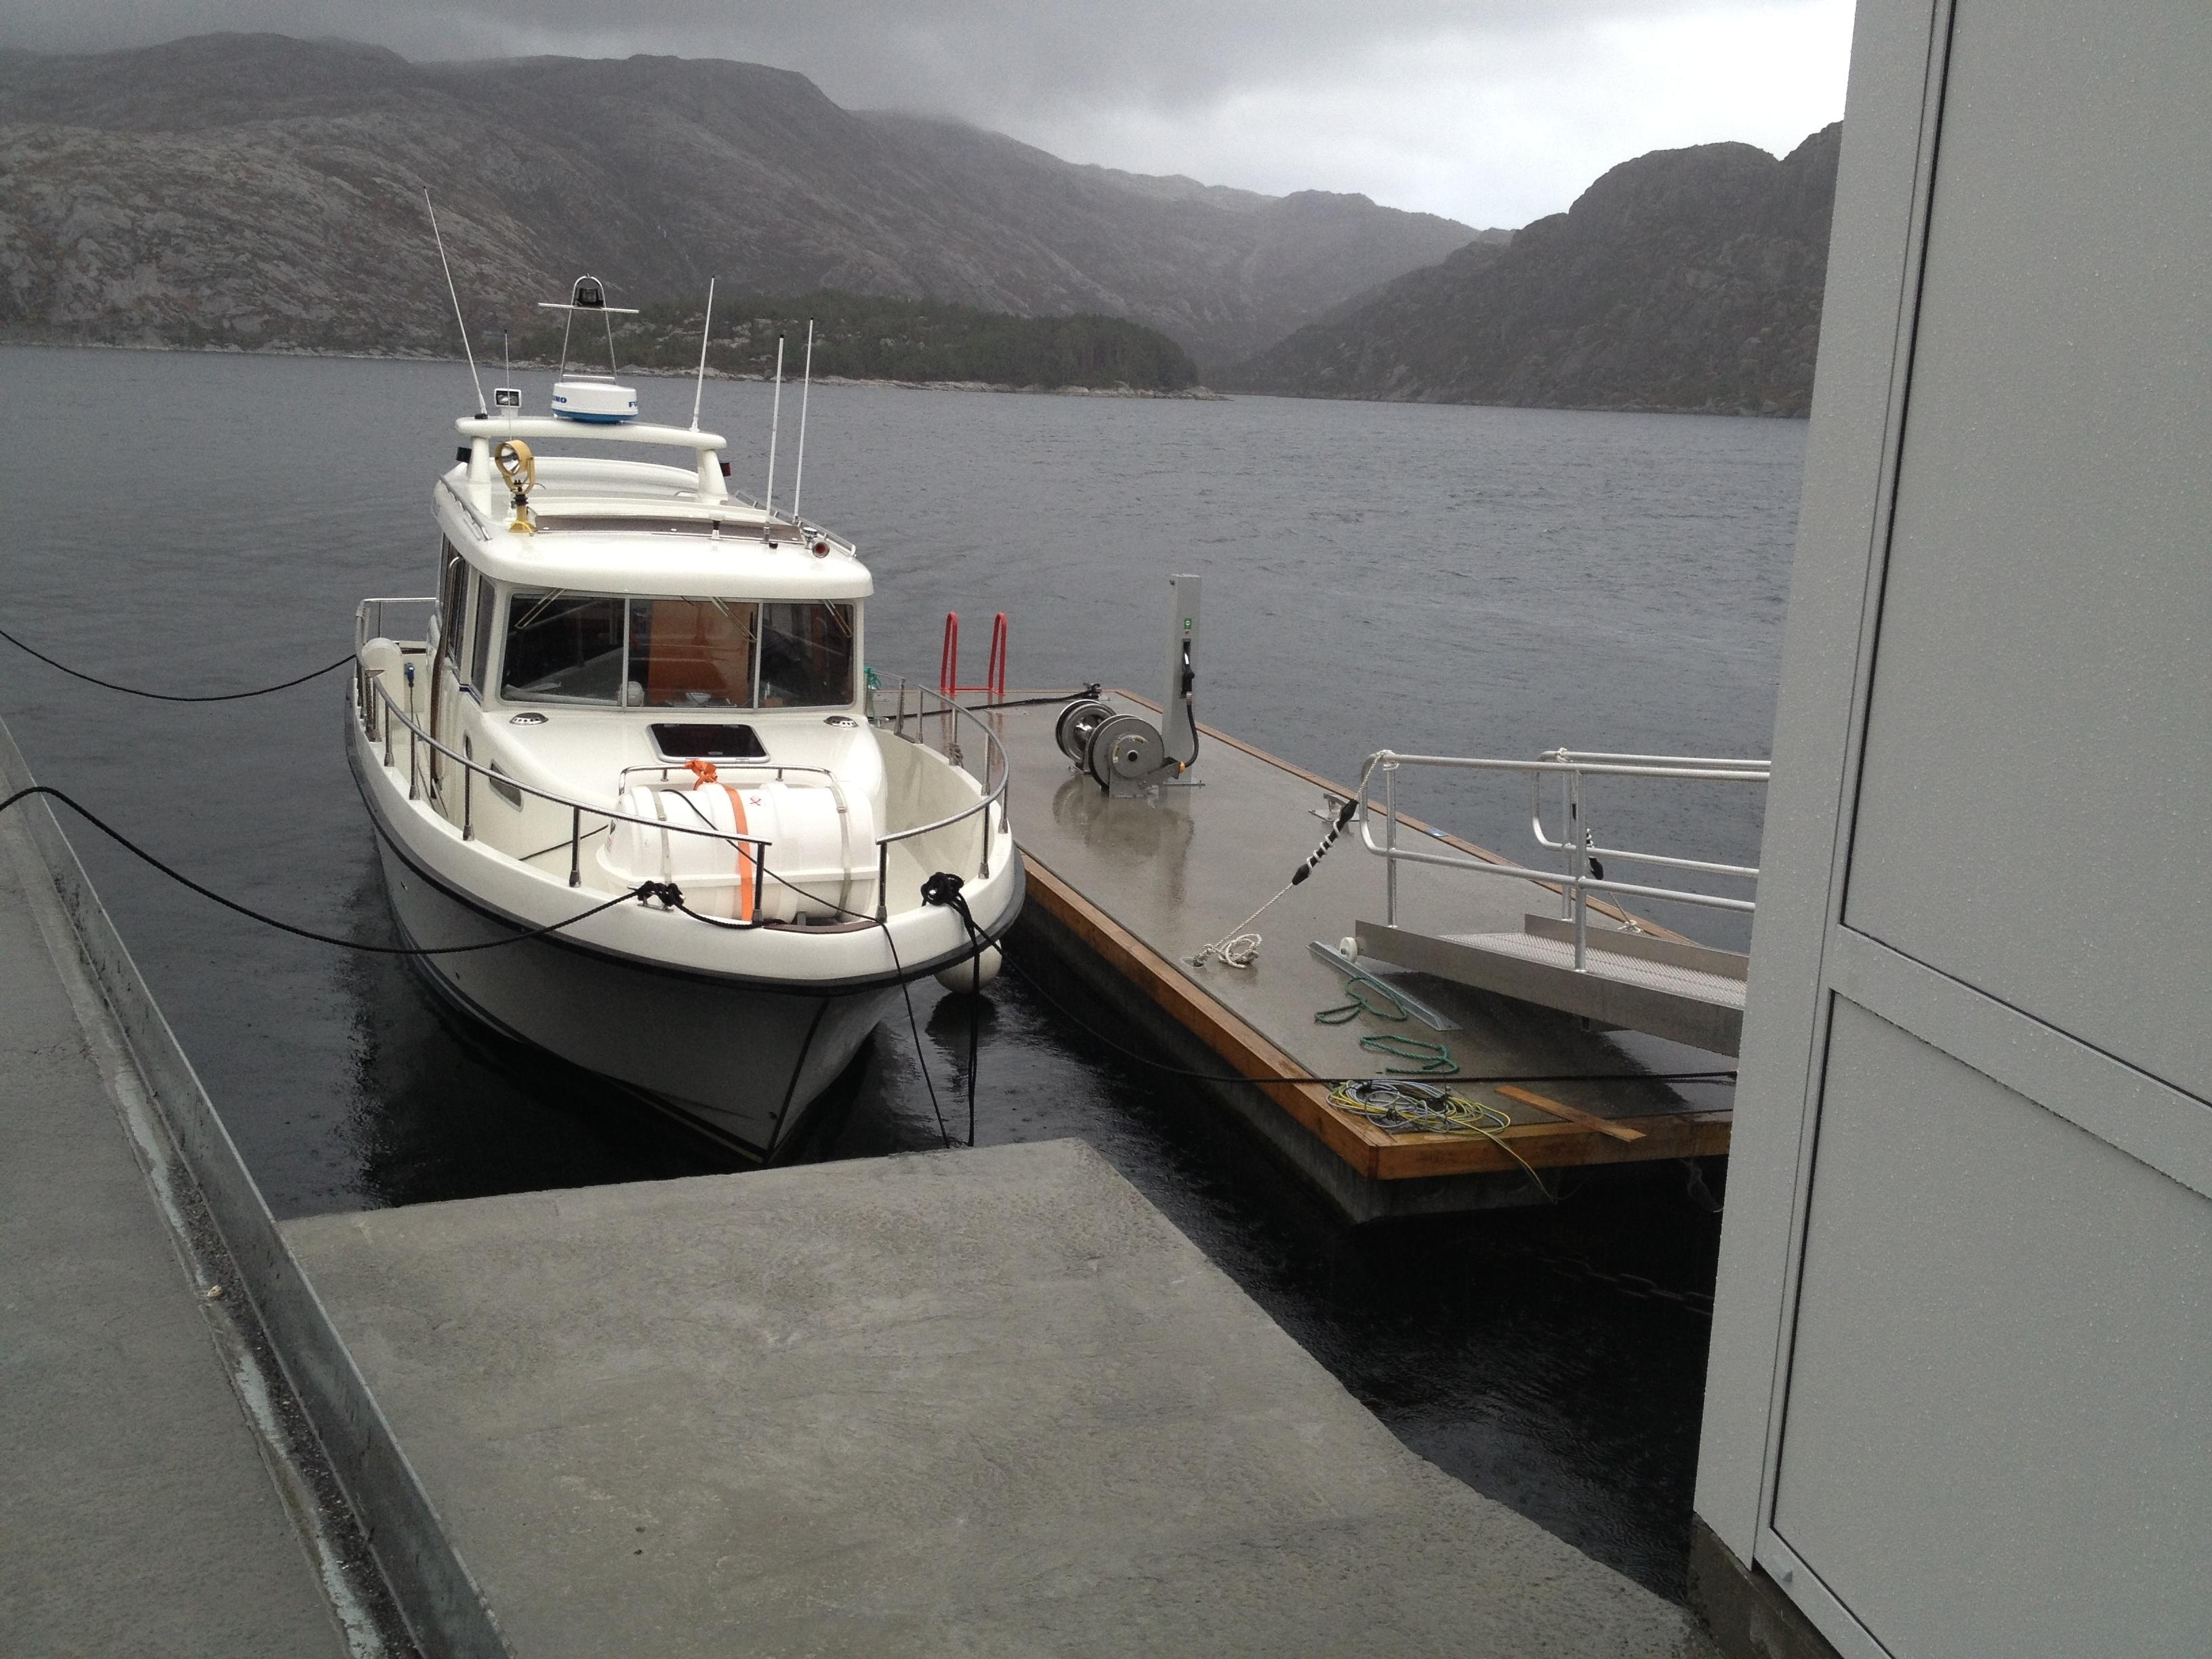 https://marinasolutions.no/uploads/Smørhamn-4.JPG